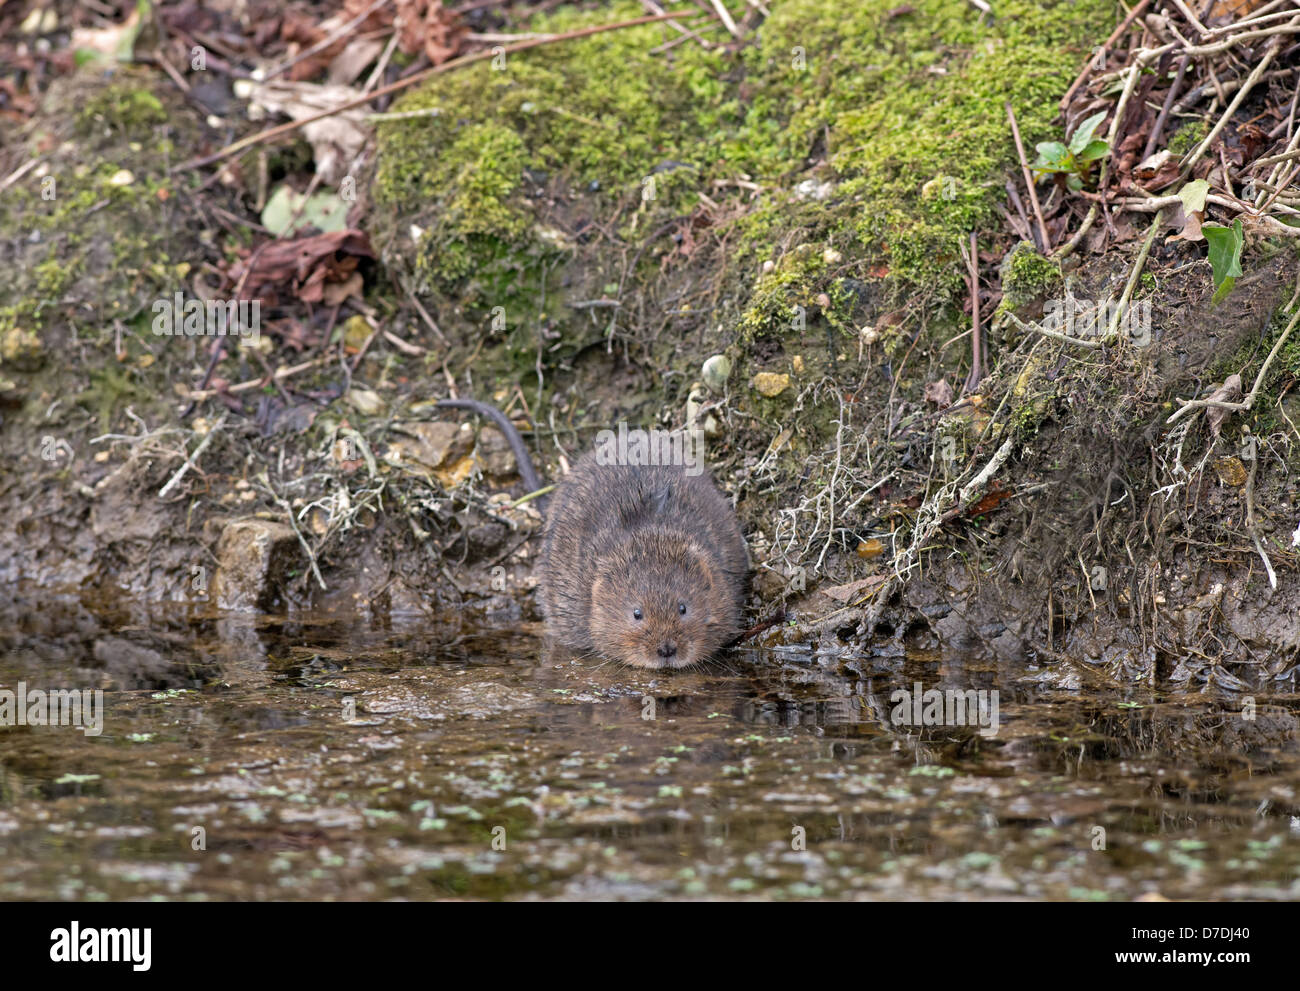 Water Vole - Arvicola terrestris beside a stream. Spring. UK - Stock Image